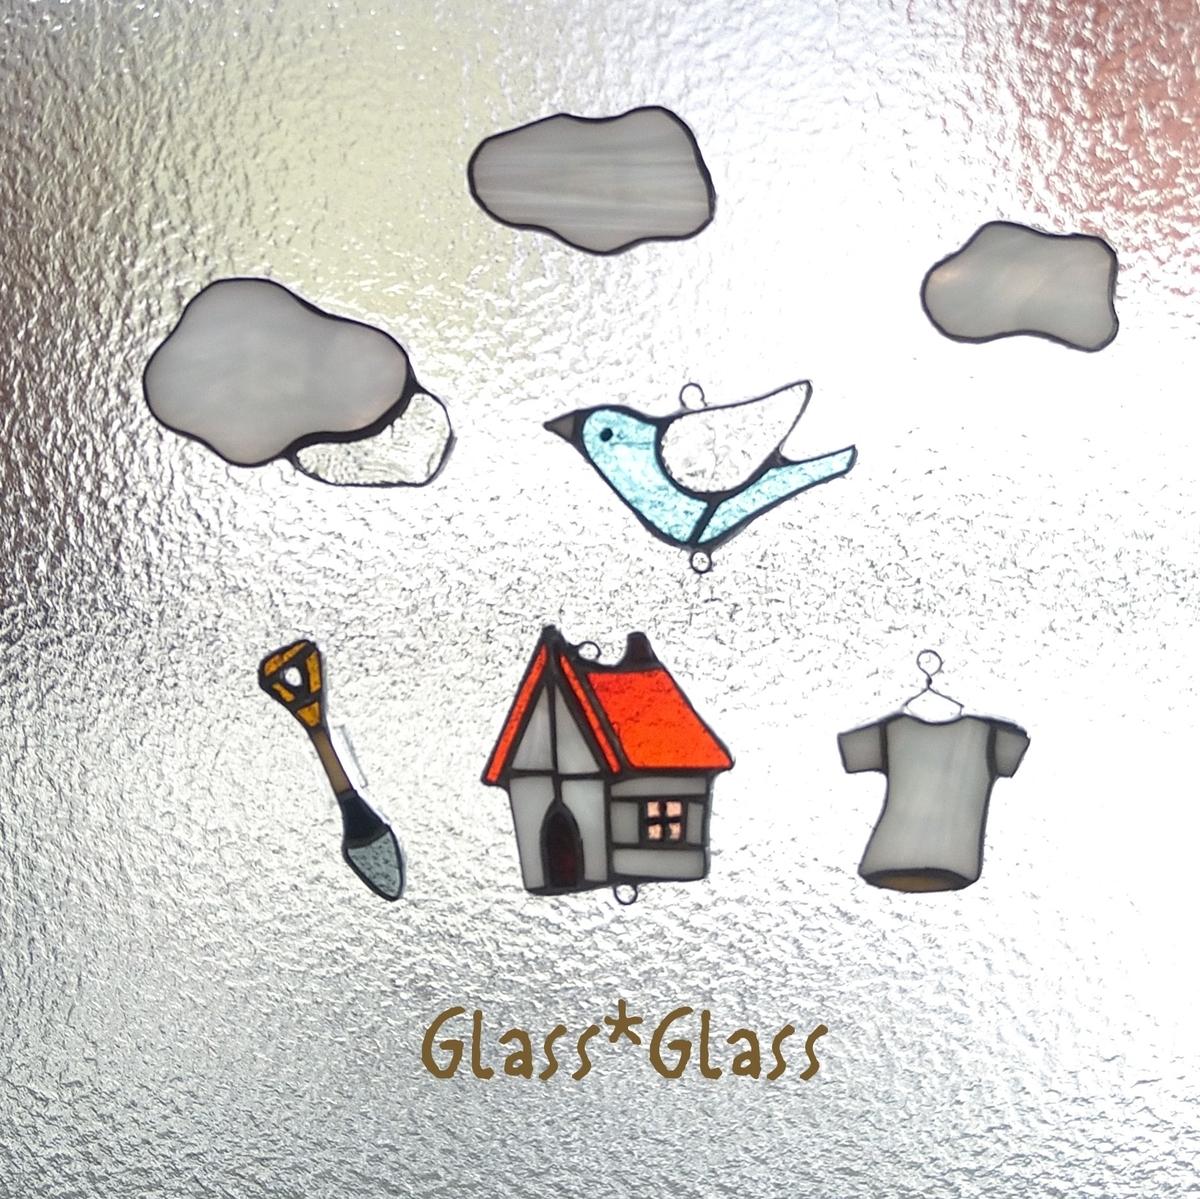 f:id:glassglassmegu:20210520154604j:plain